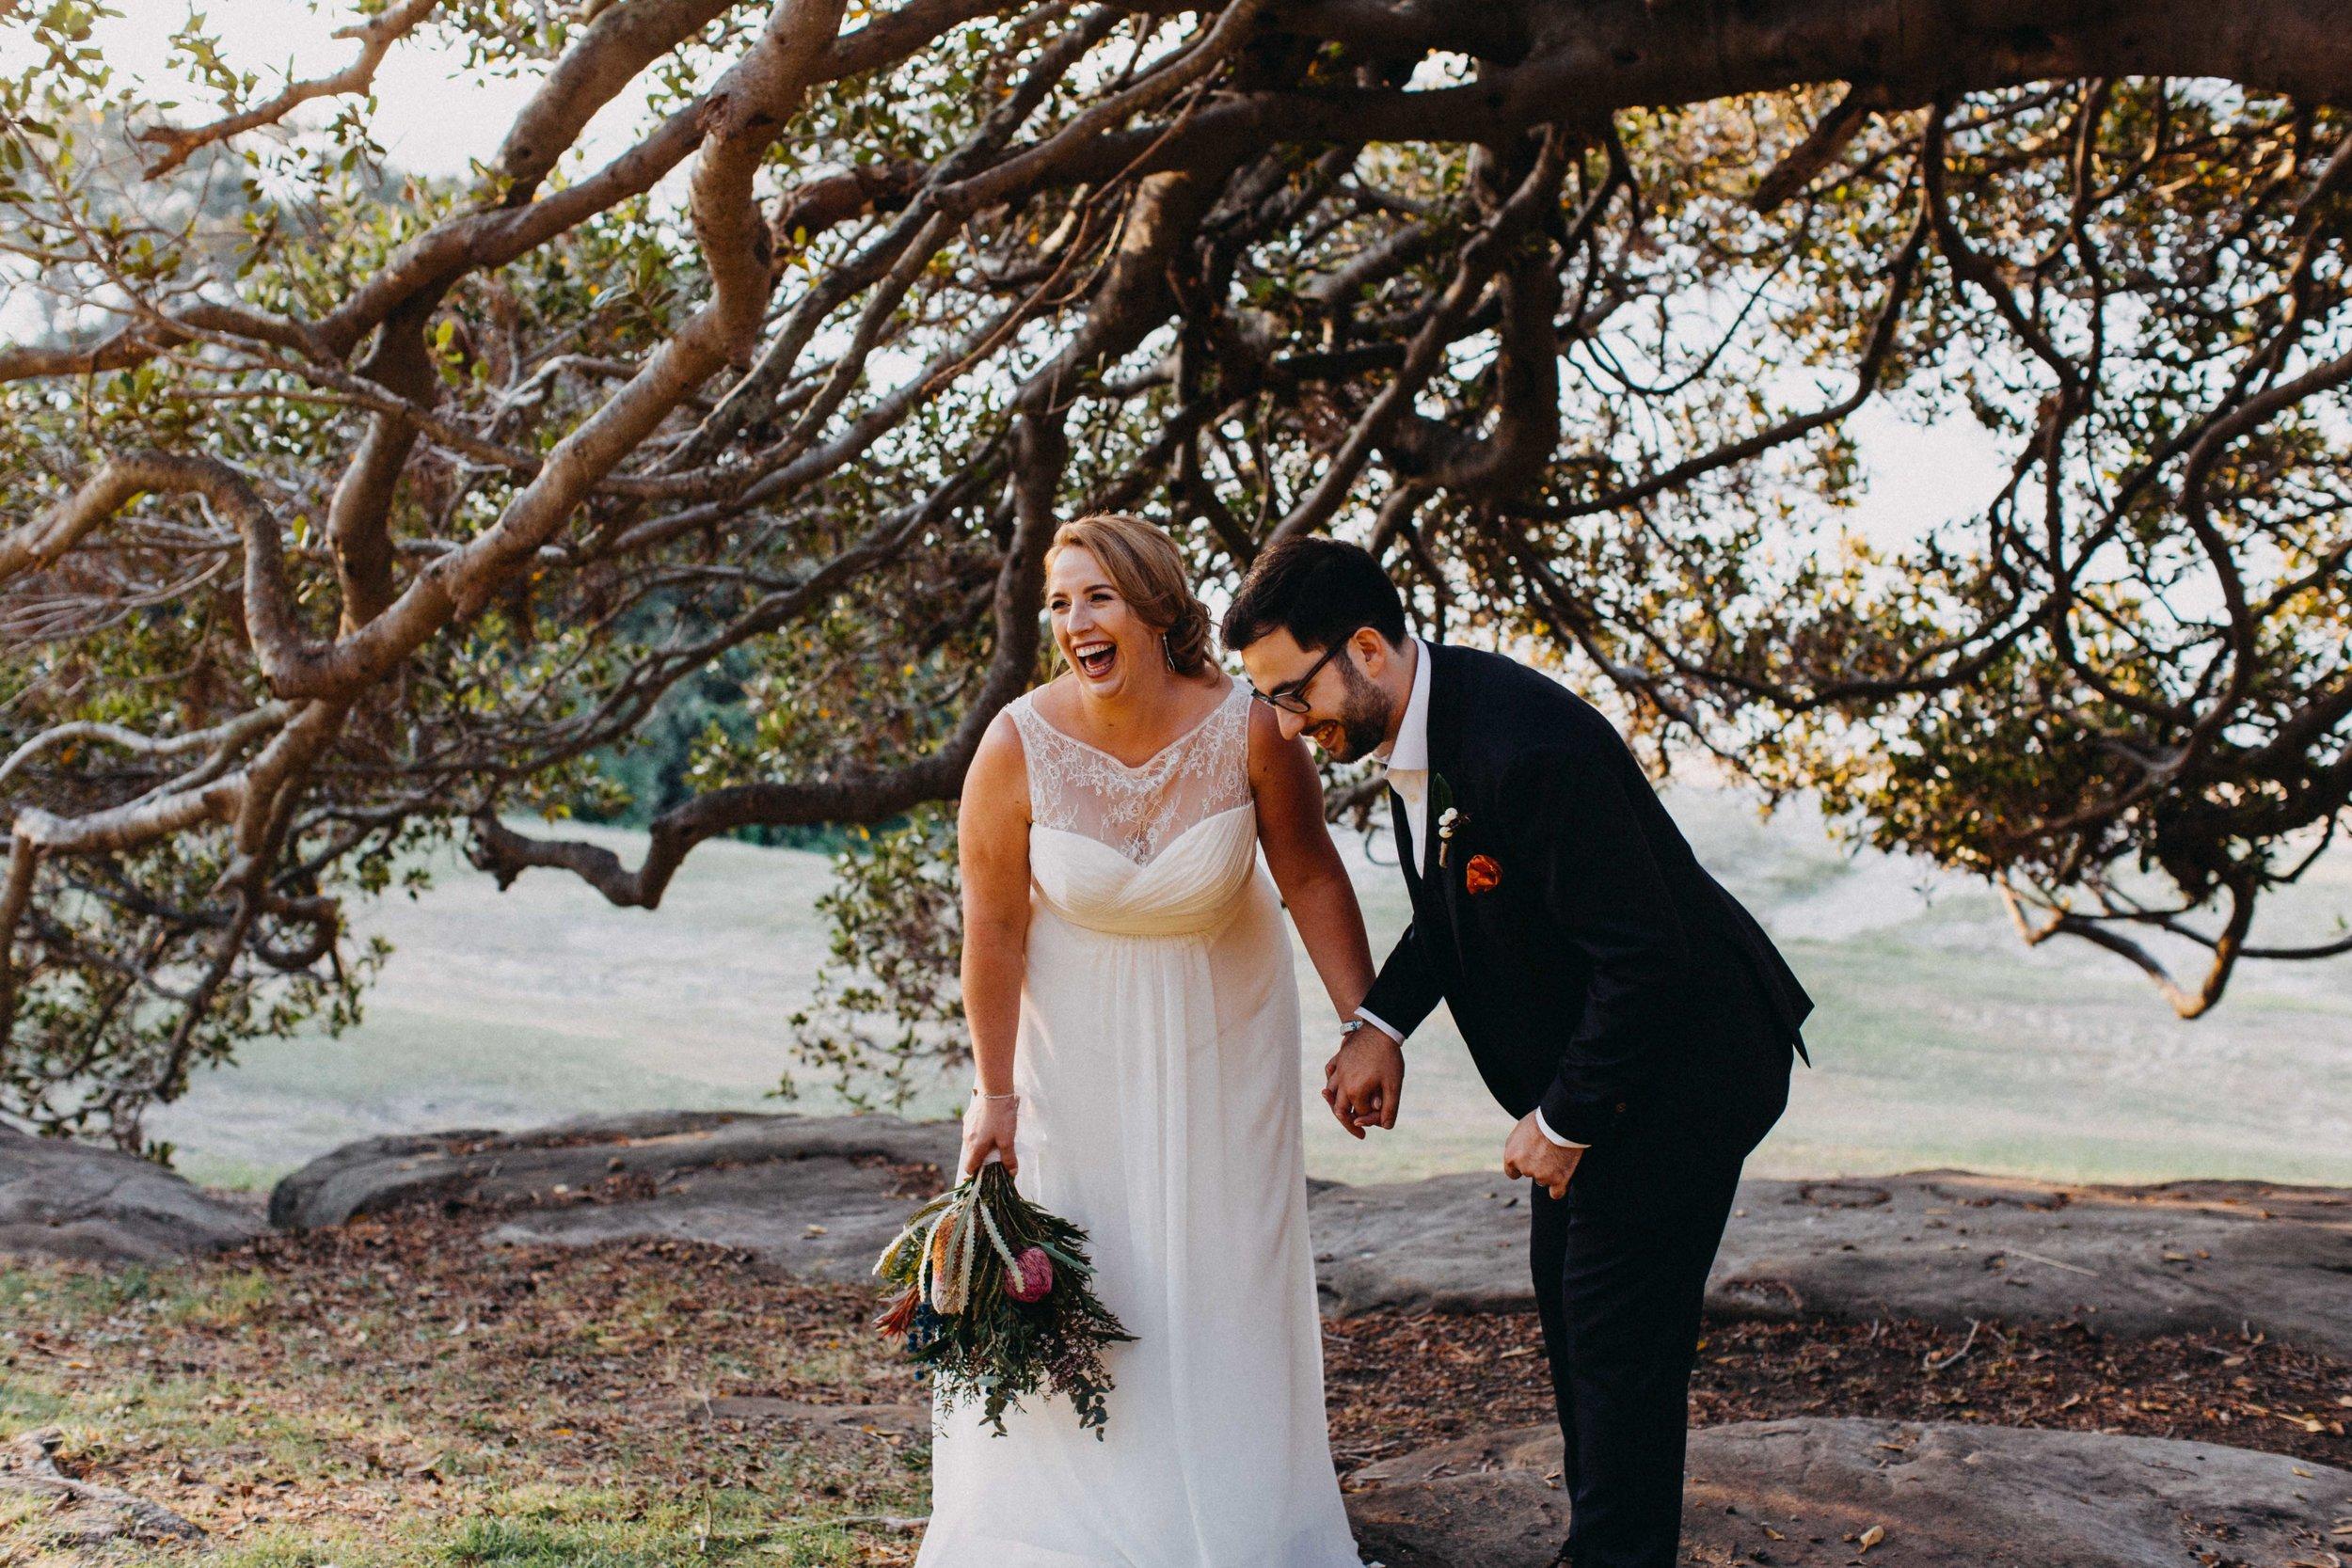 cabarita-park-sydney-wedding-emilyobrienphotography.net-41.jpg